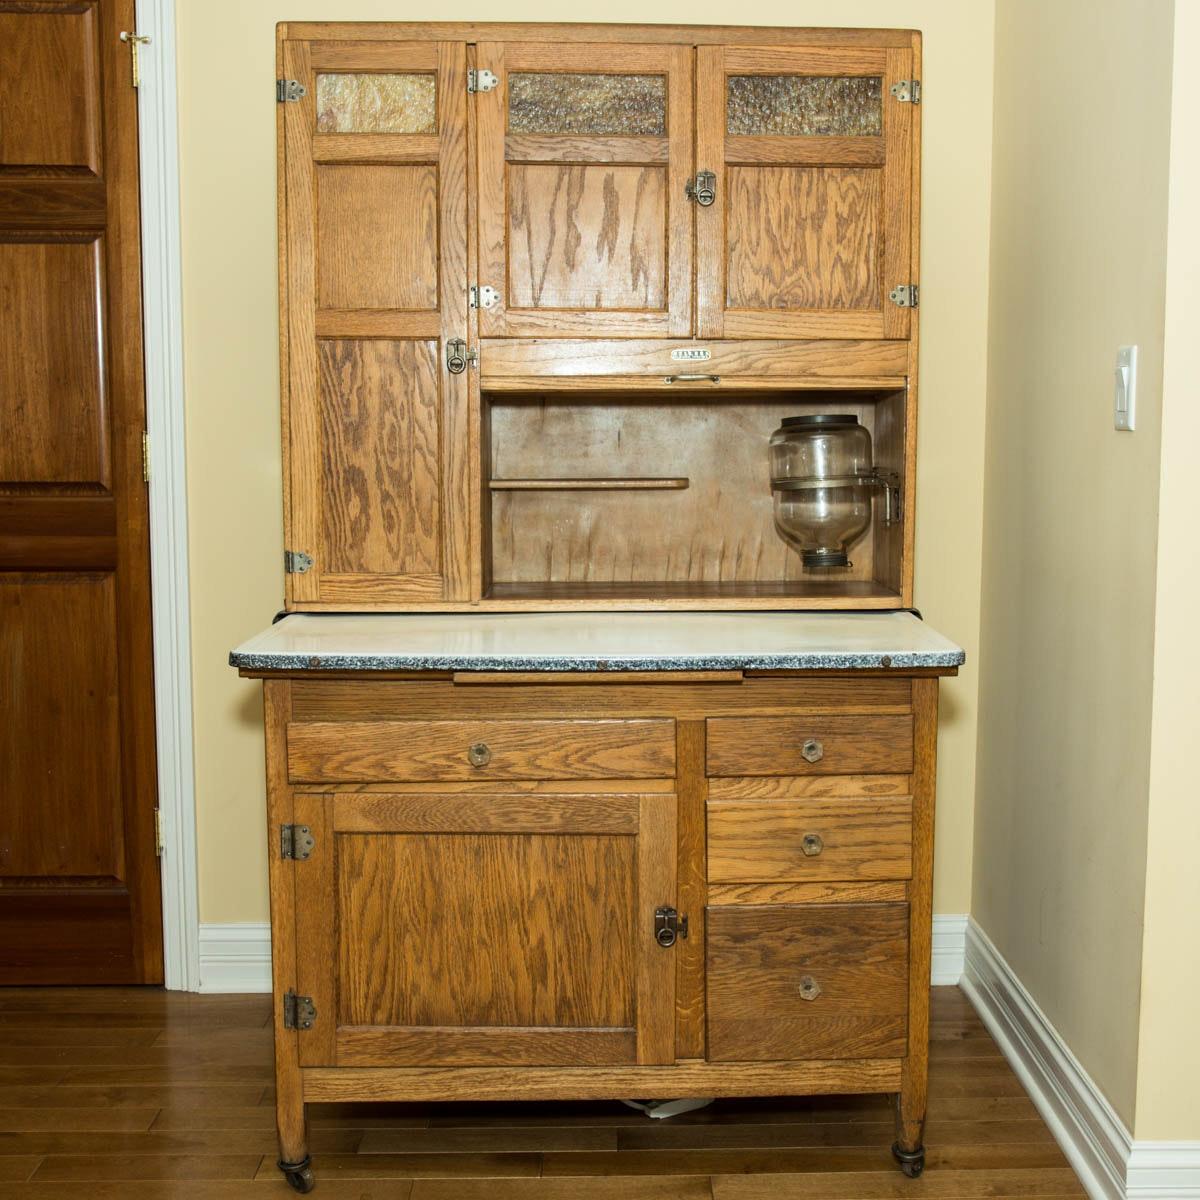 Sellers Kitchen Cabinet: 1920's Hoosier Style Seller's Kitchen Cabinet : EBTH